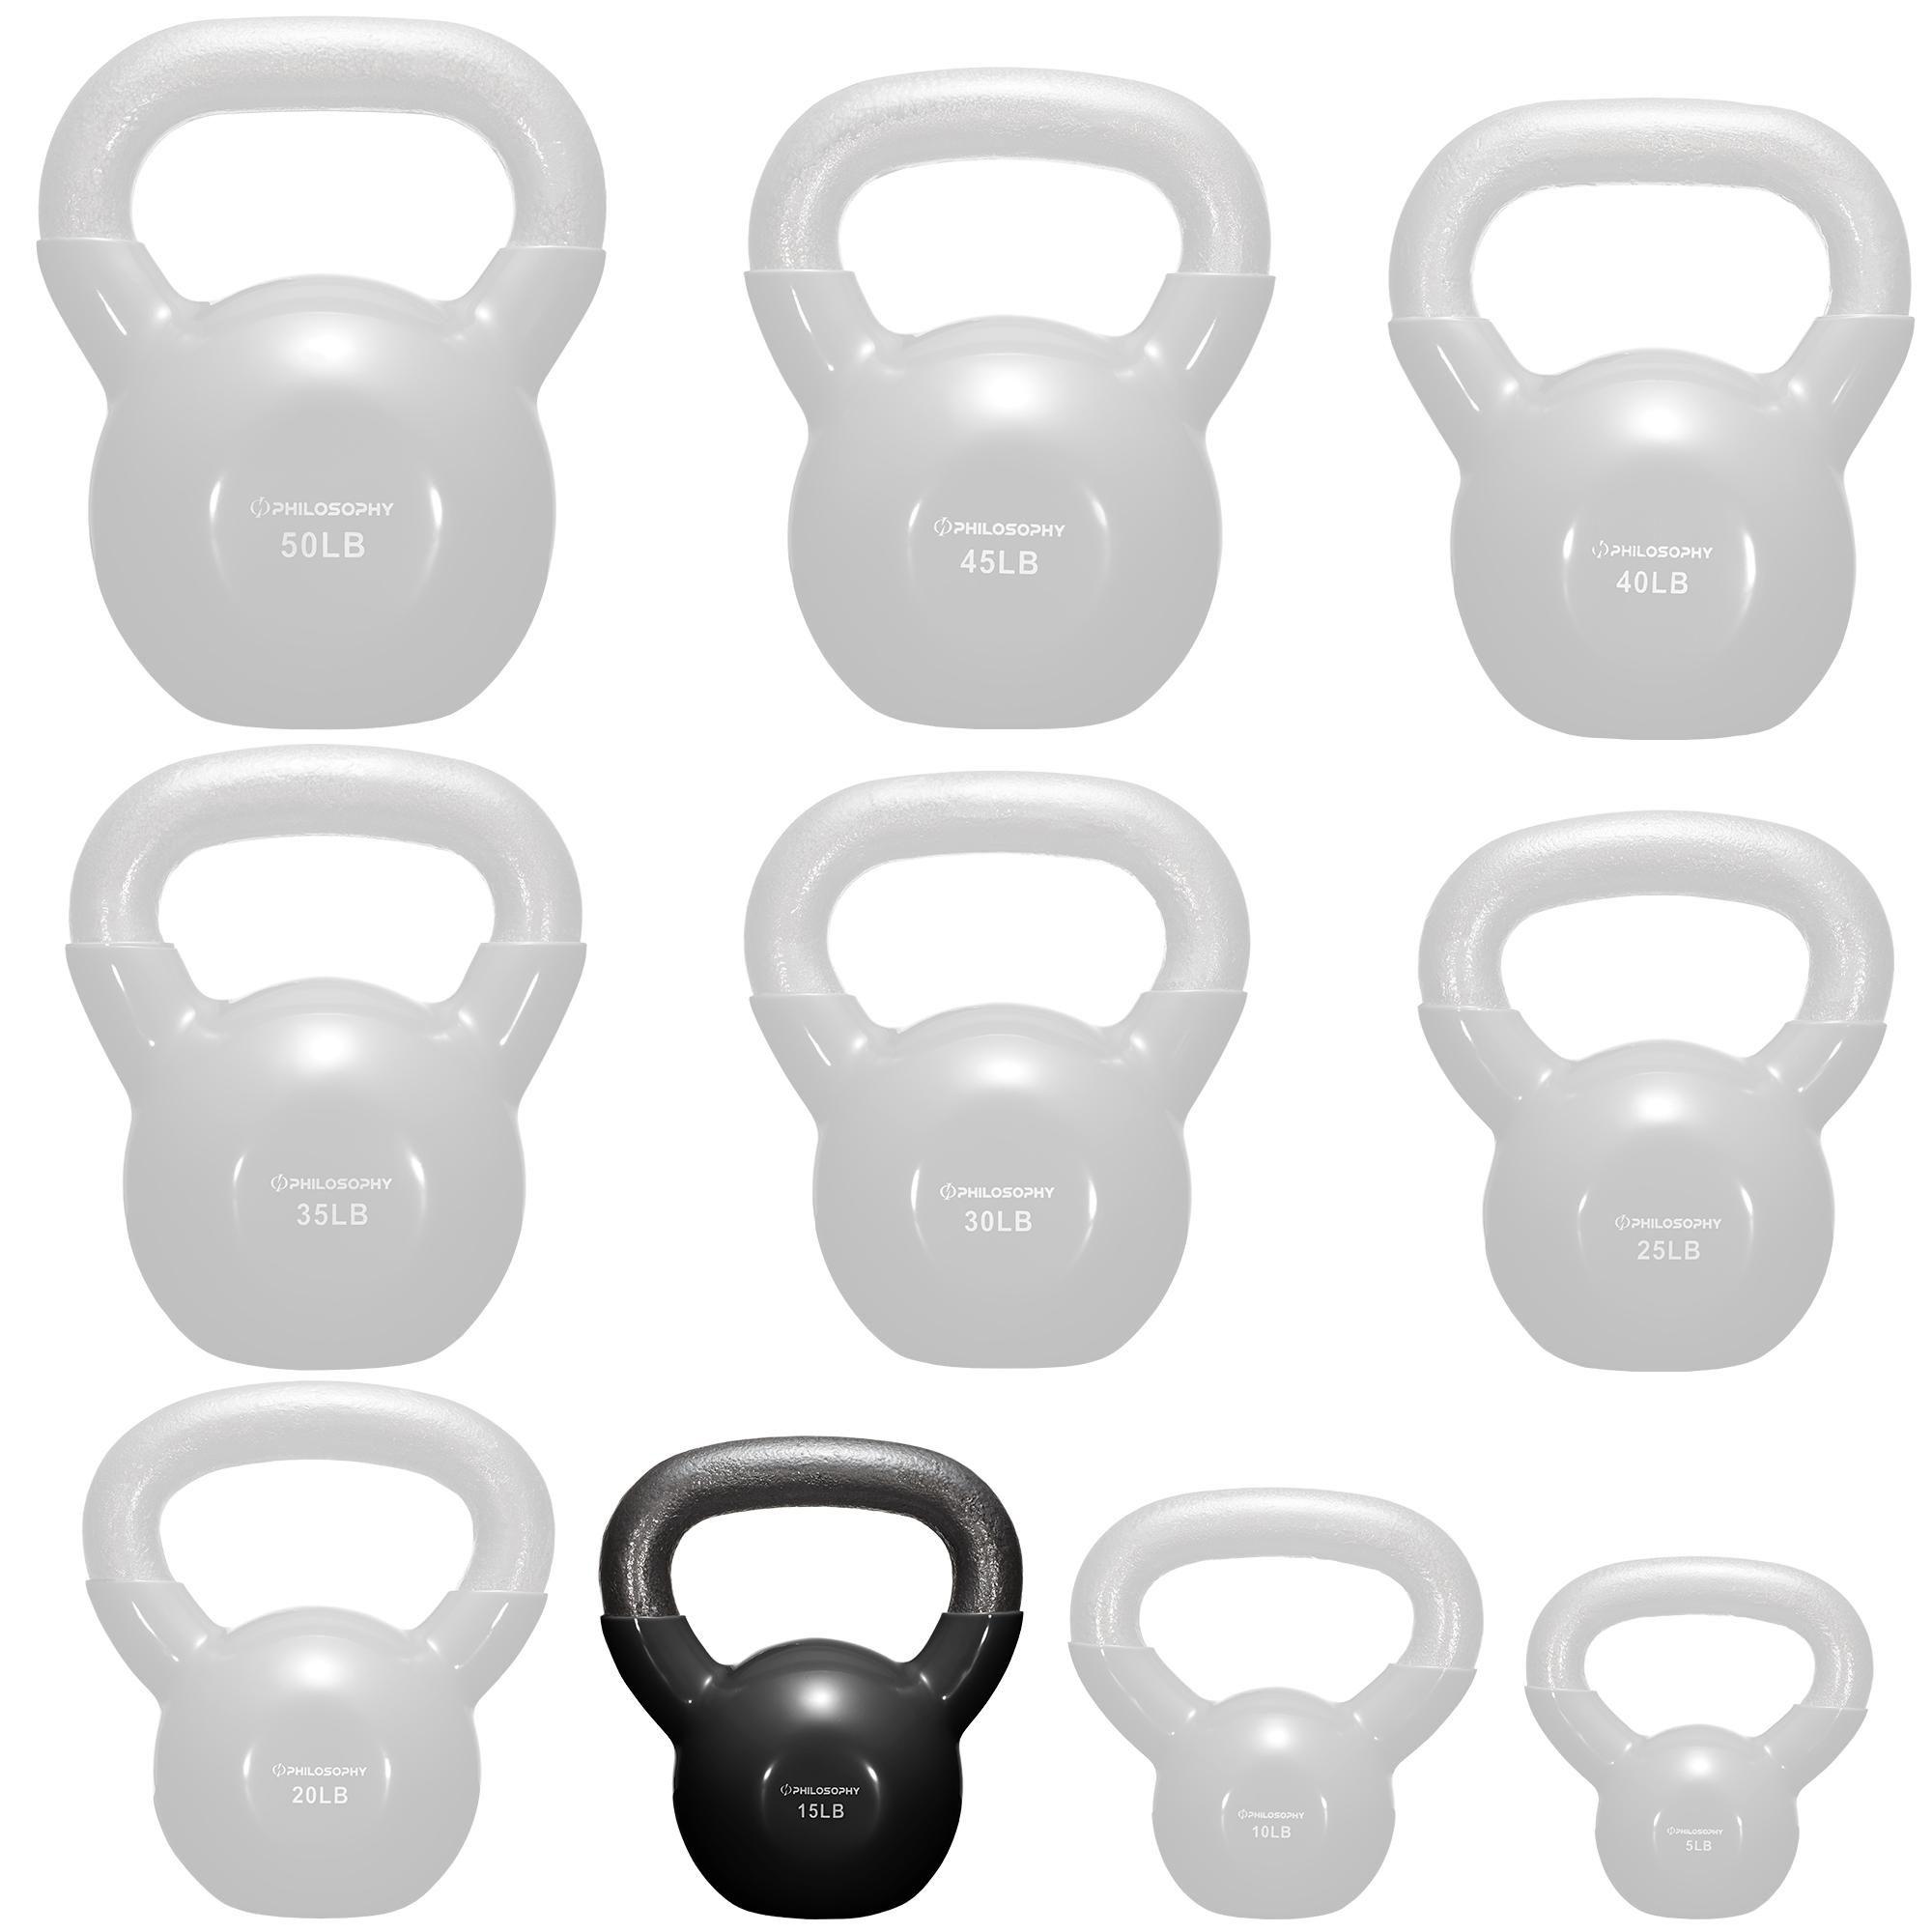 Philosophy Gym Vinyl Coated Cast Iron Kettlebell Weight 15 lbs - Black